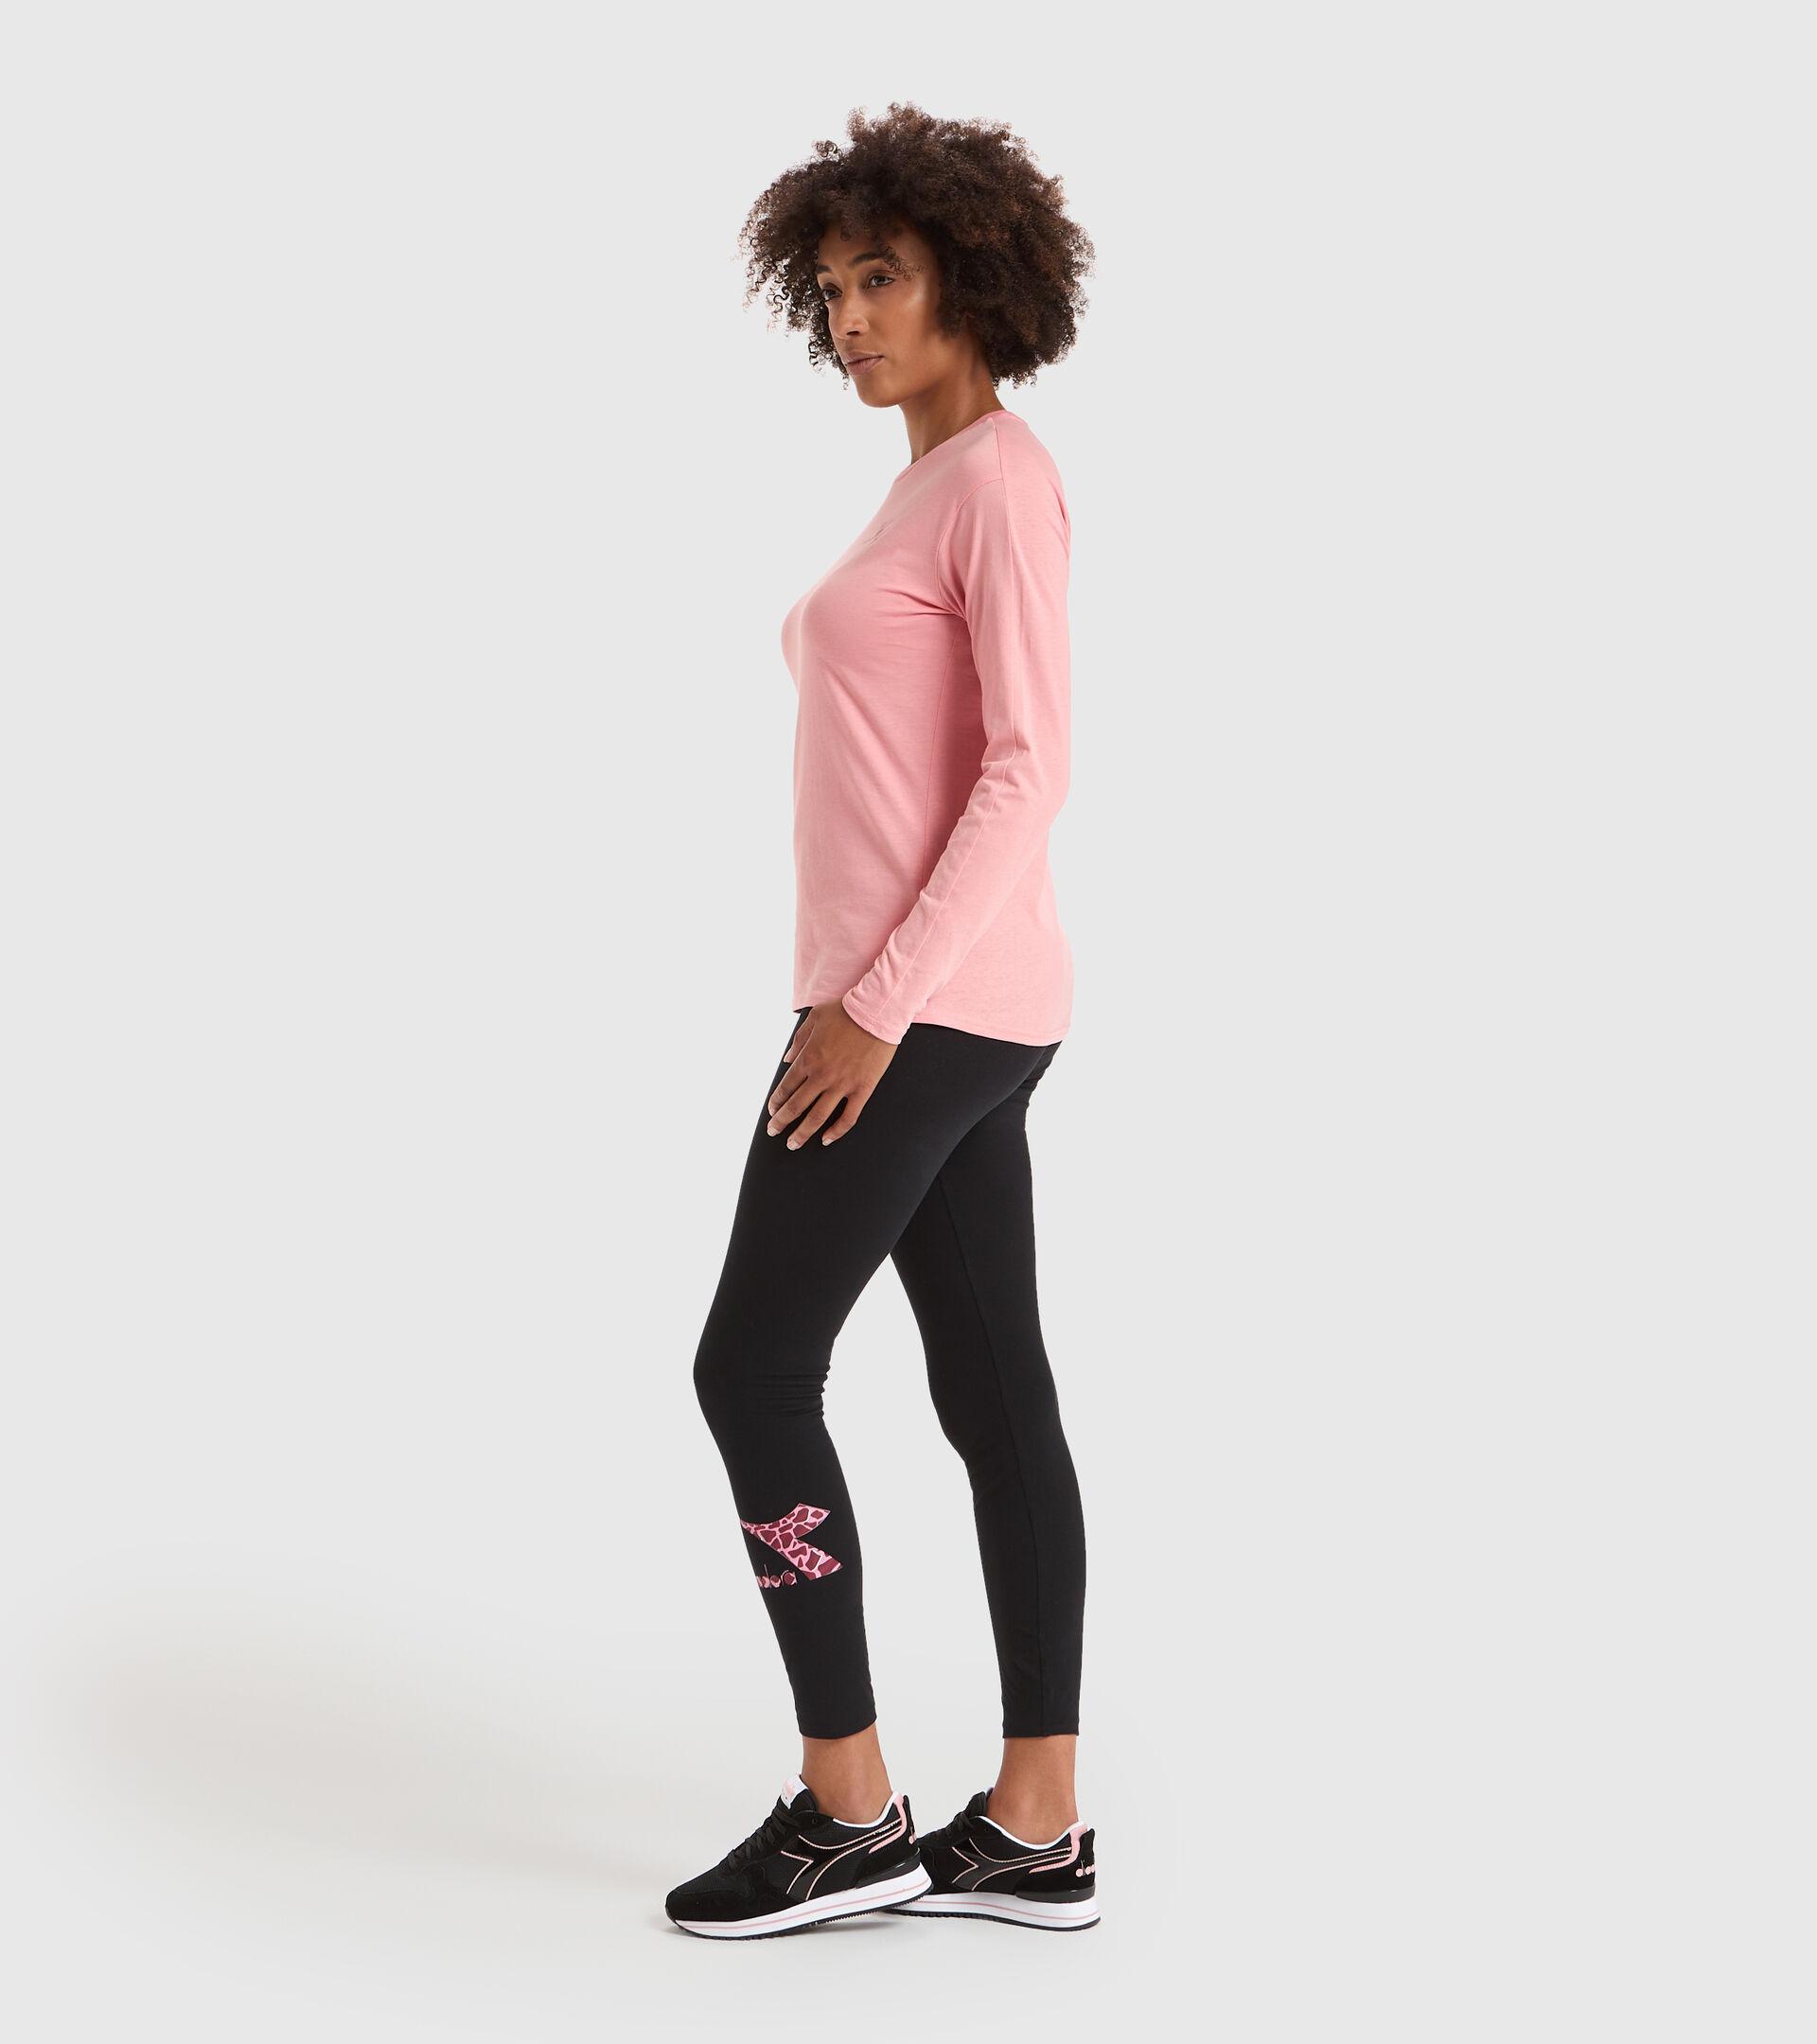 Pantaloni sportivi - Donna L.LEGGINGS LUSH NERO - Diadora